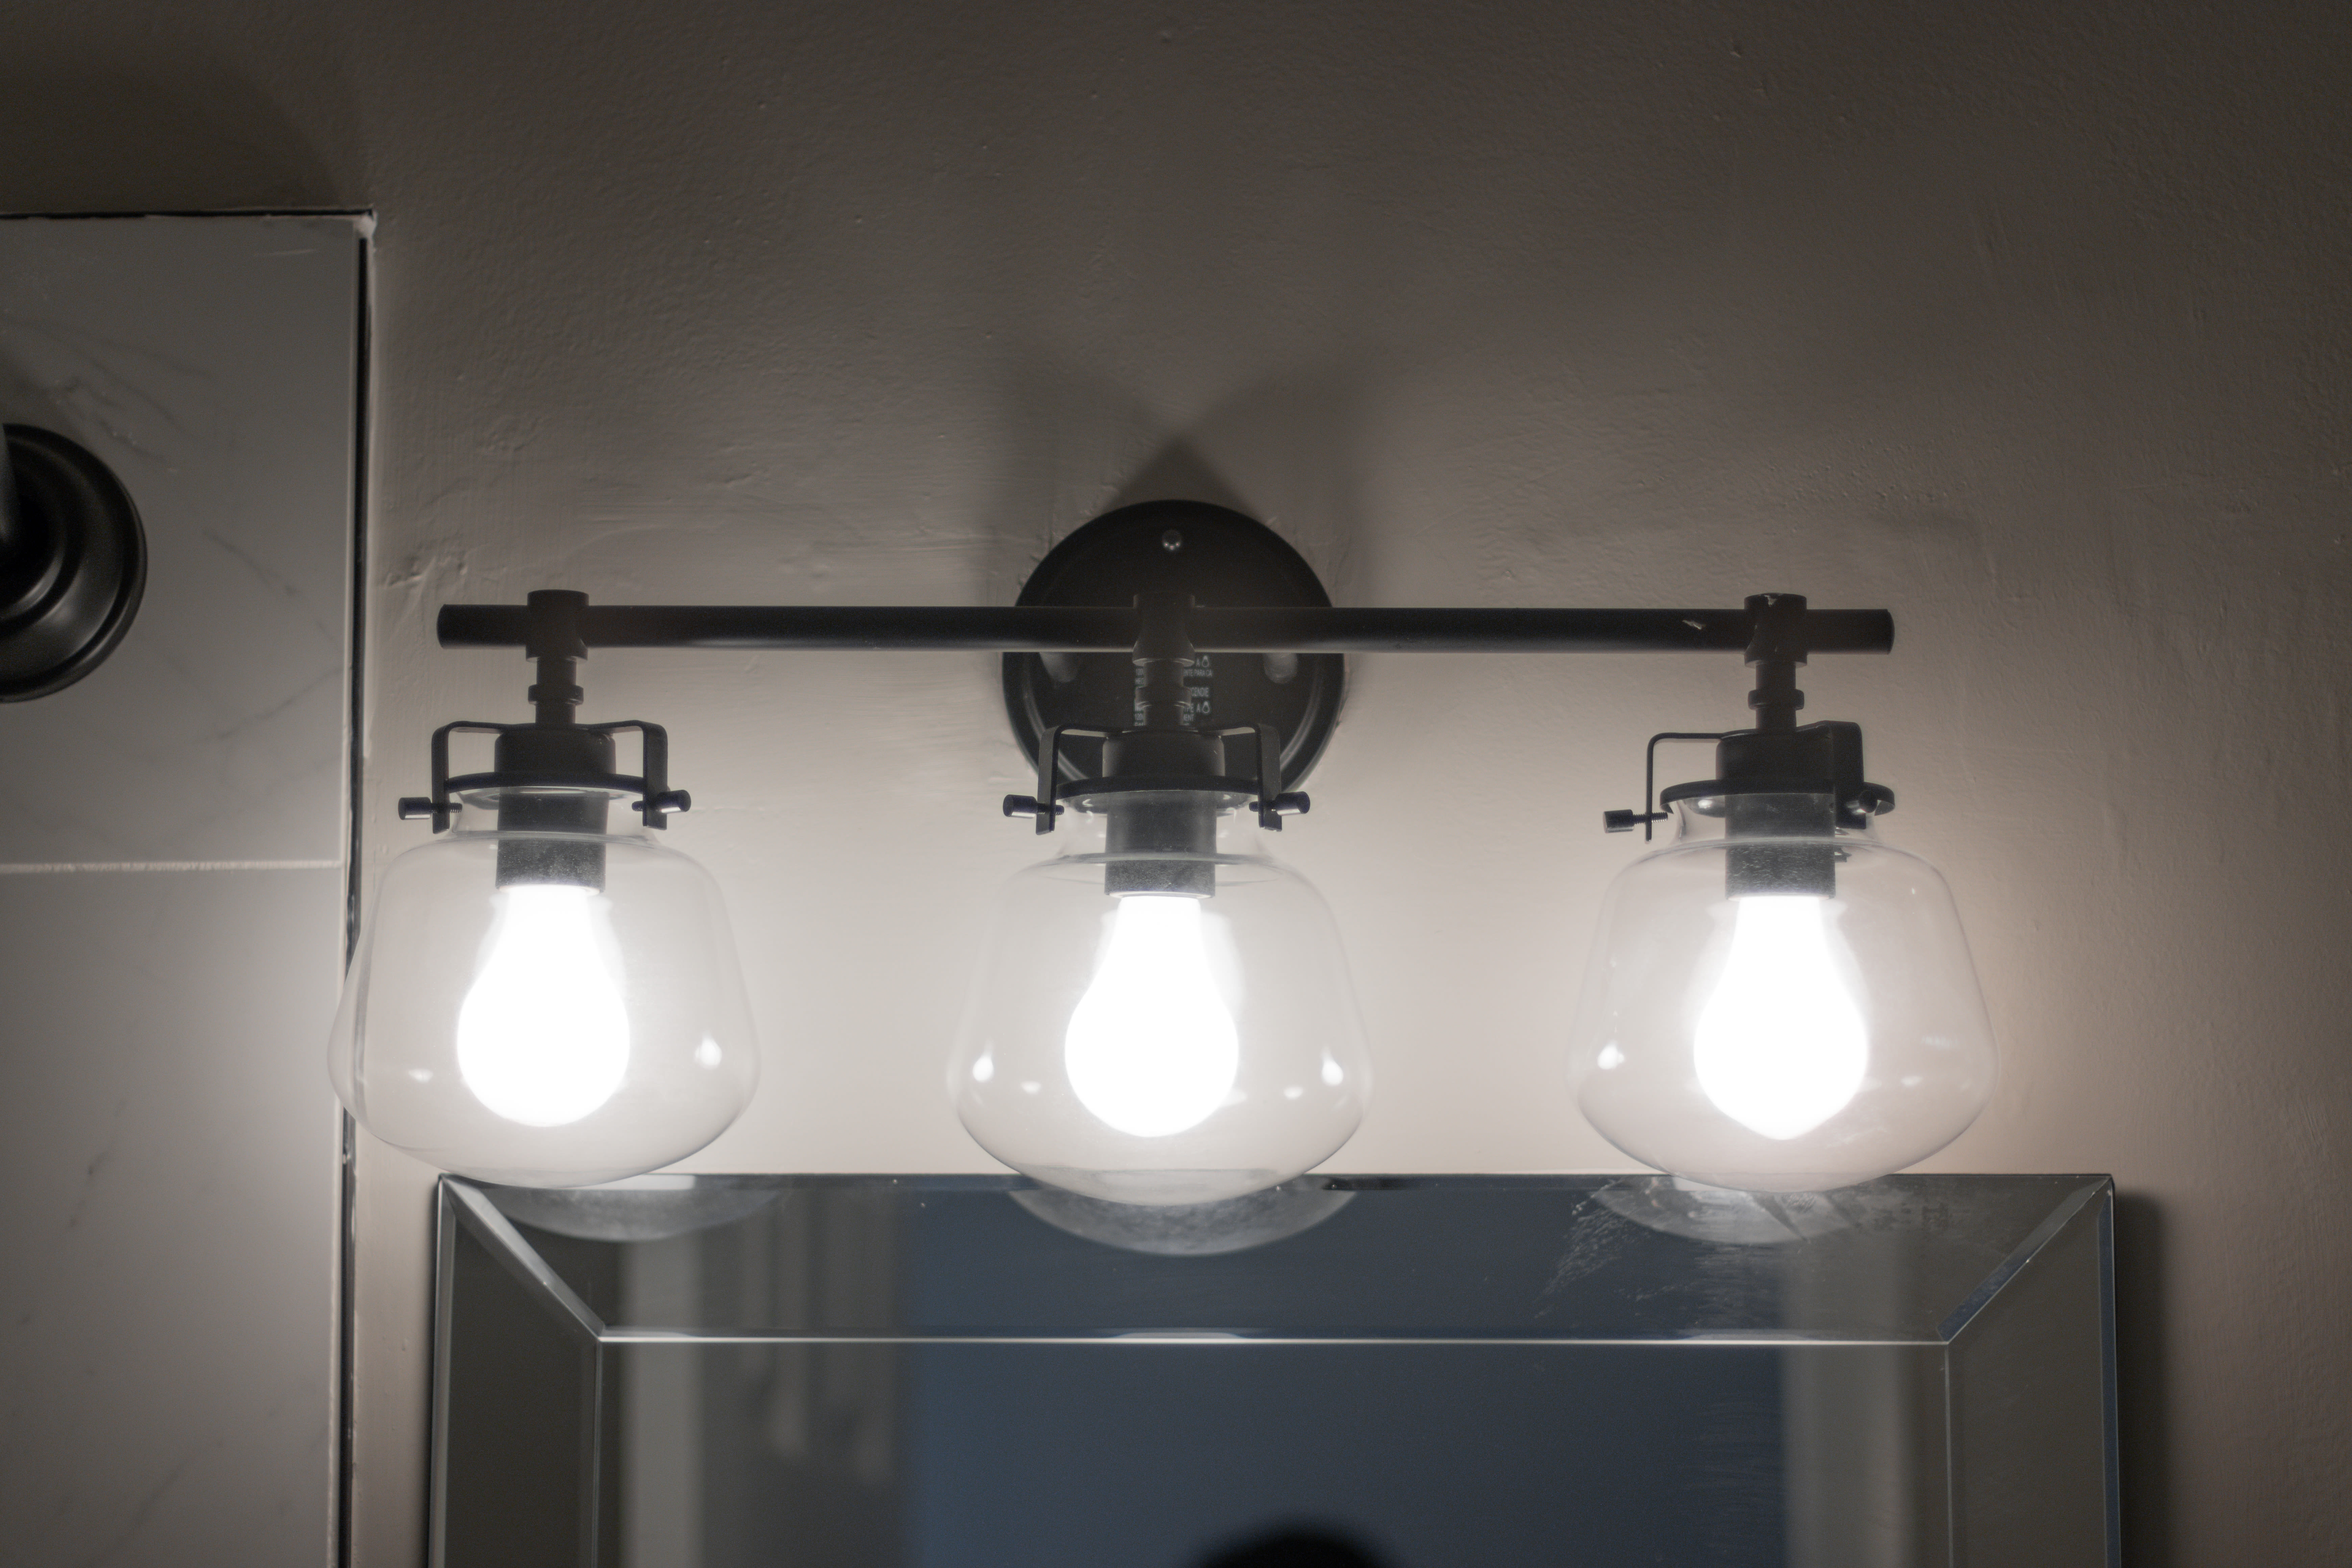 Bathroom lighting at Regency Pointe in Forestville, Maryland